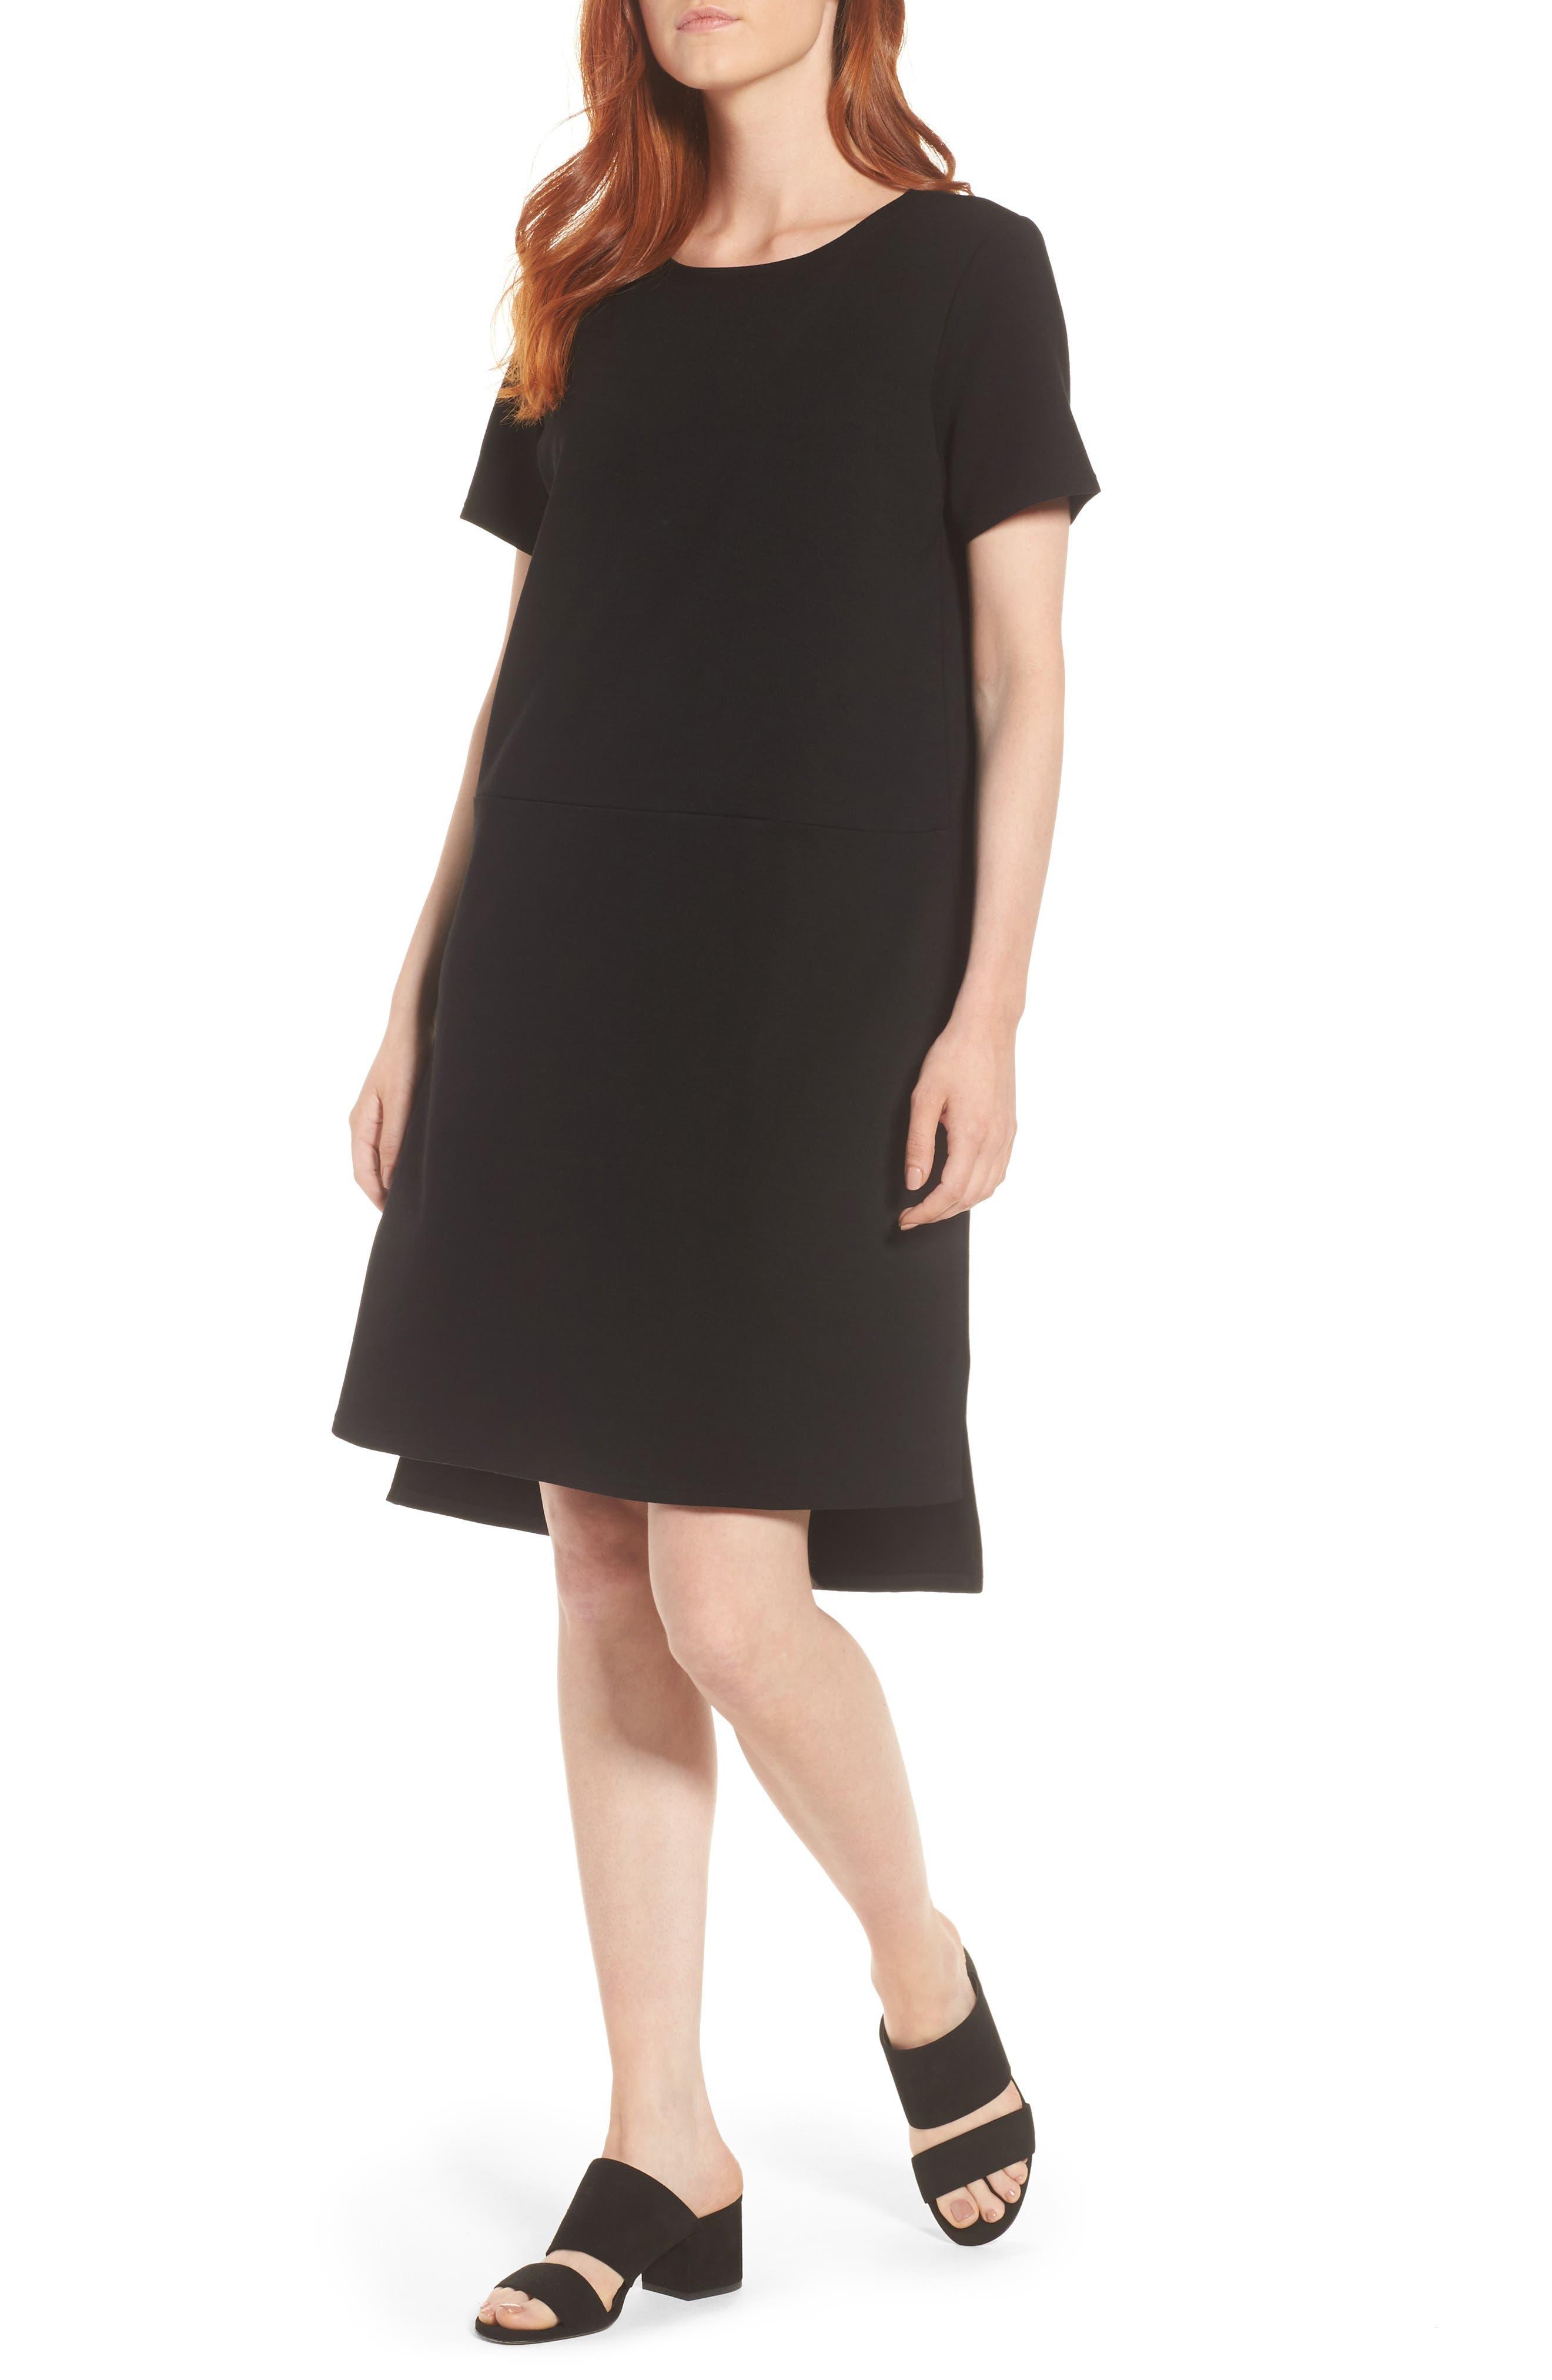 Tencel<sup>®</sup> Lyocell Blend Knit Shift Dress,                         Main,                         color, Black